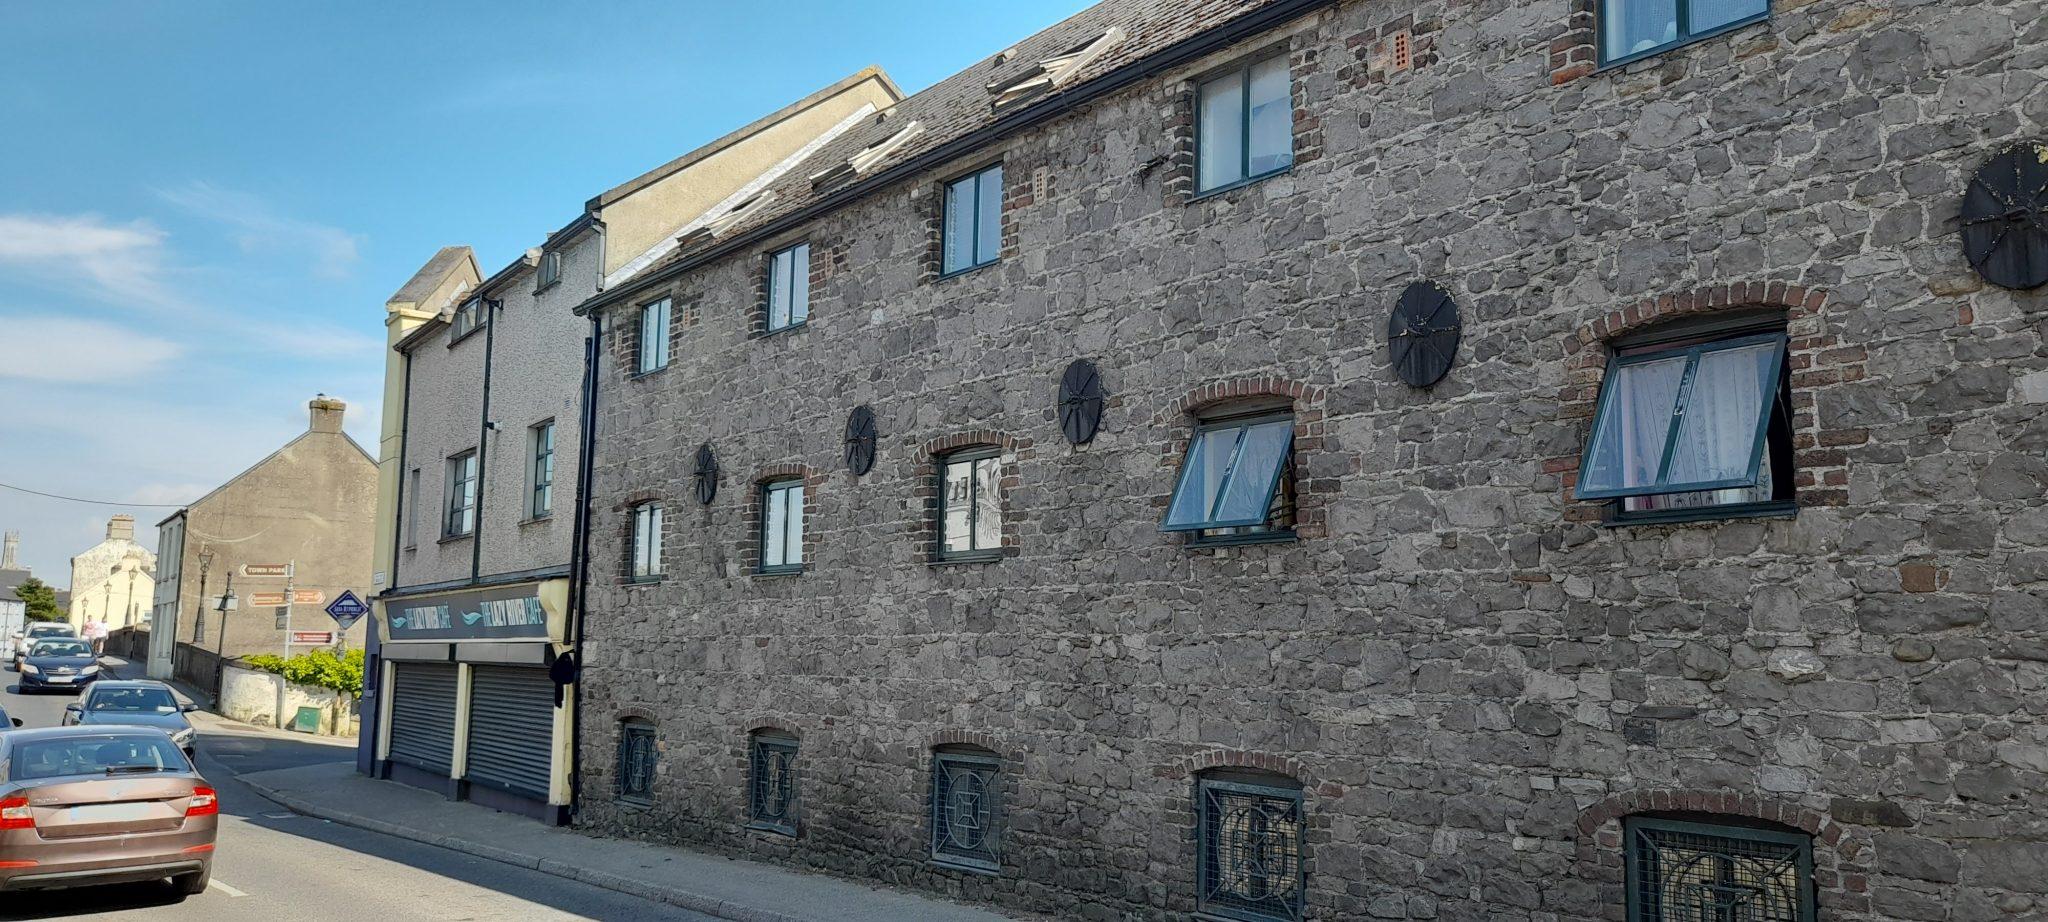 8 The Brewery, Block 1, Bridge Street, Graiguecullen, Carlow